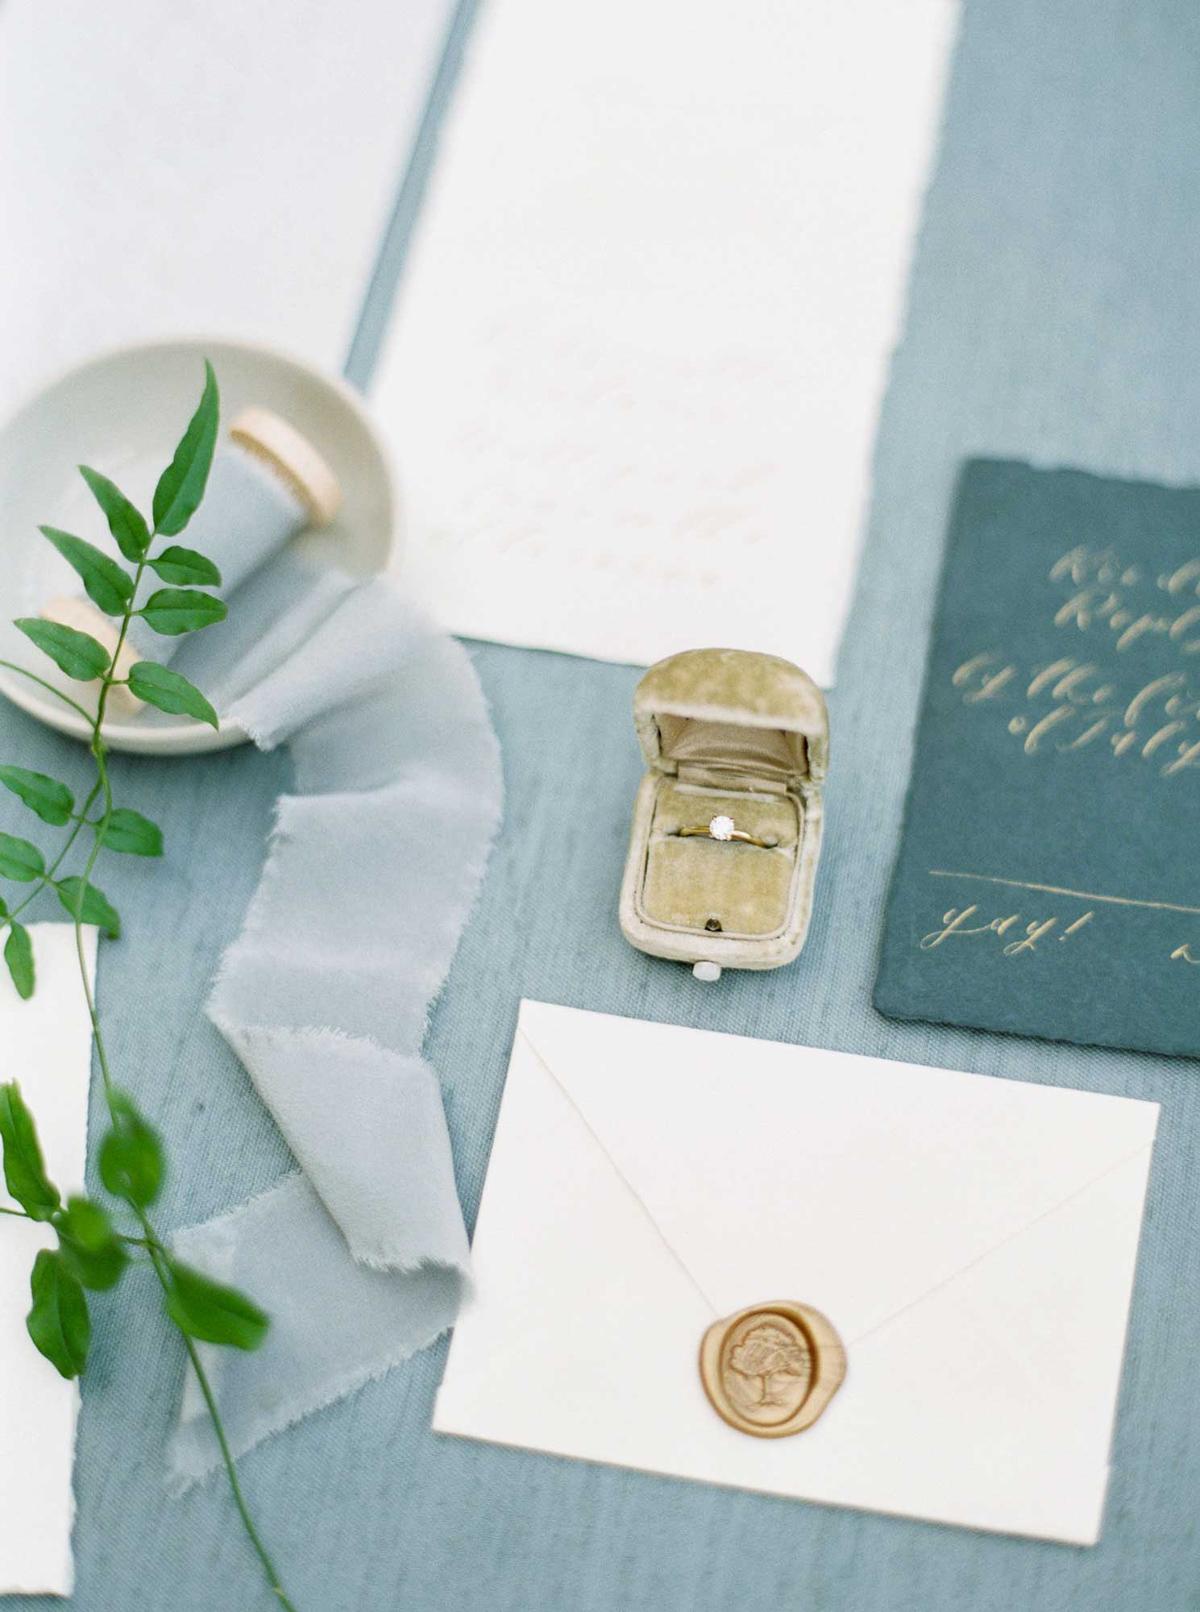 kayla-yestal-vineyard-bride-swish-list-woodland-weddings-niagara-wedding-editorial-11.jpg